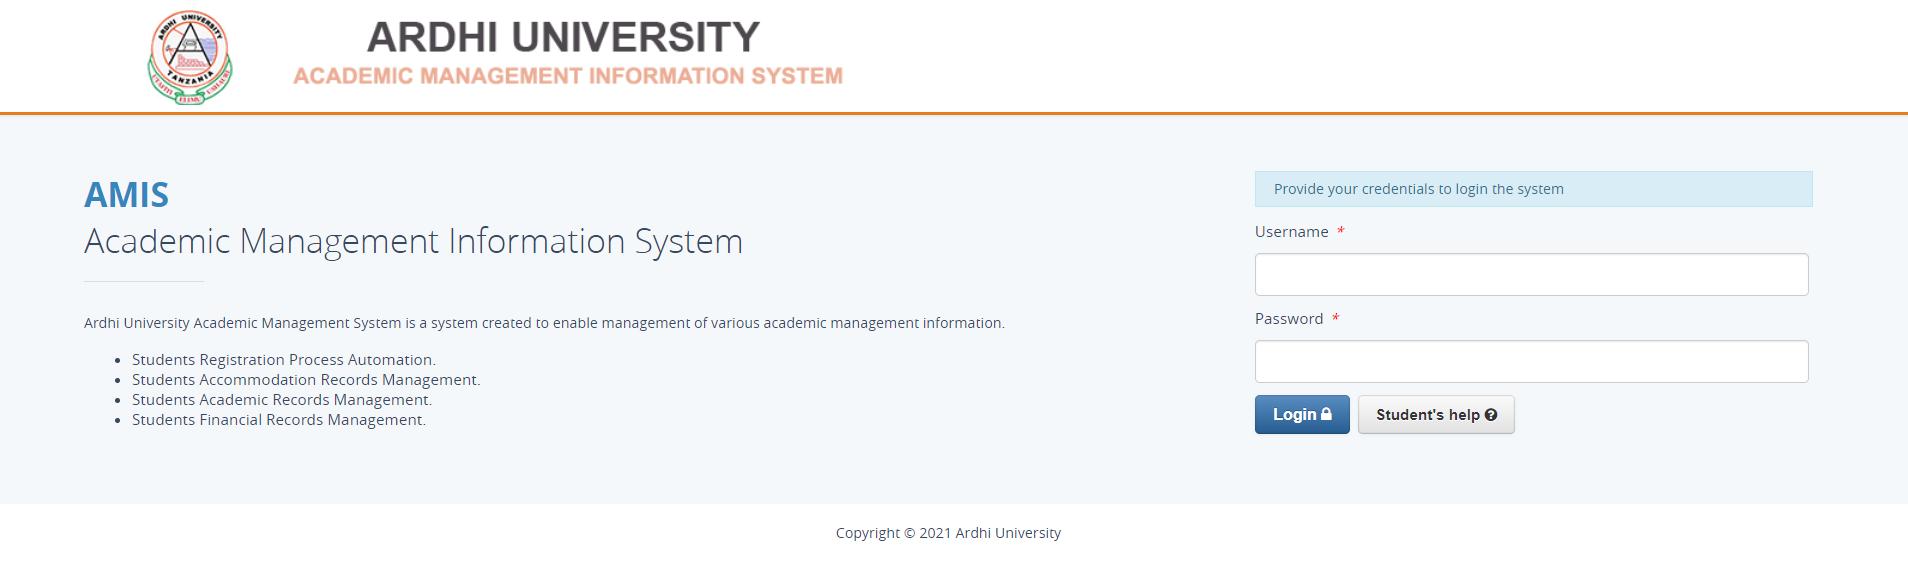 Ardhi University Academic Management Information System